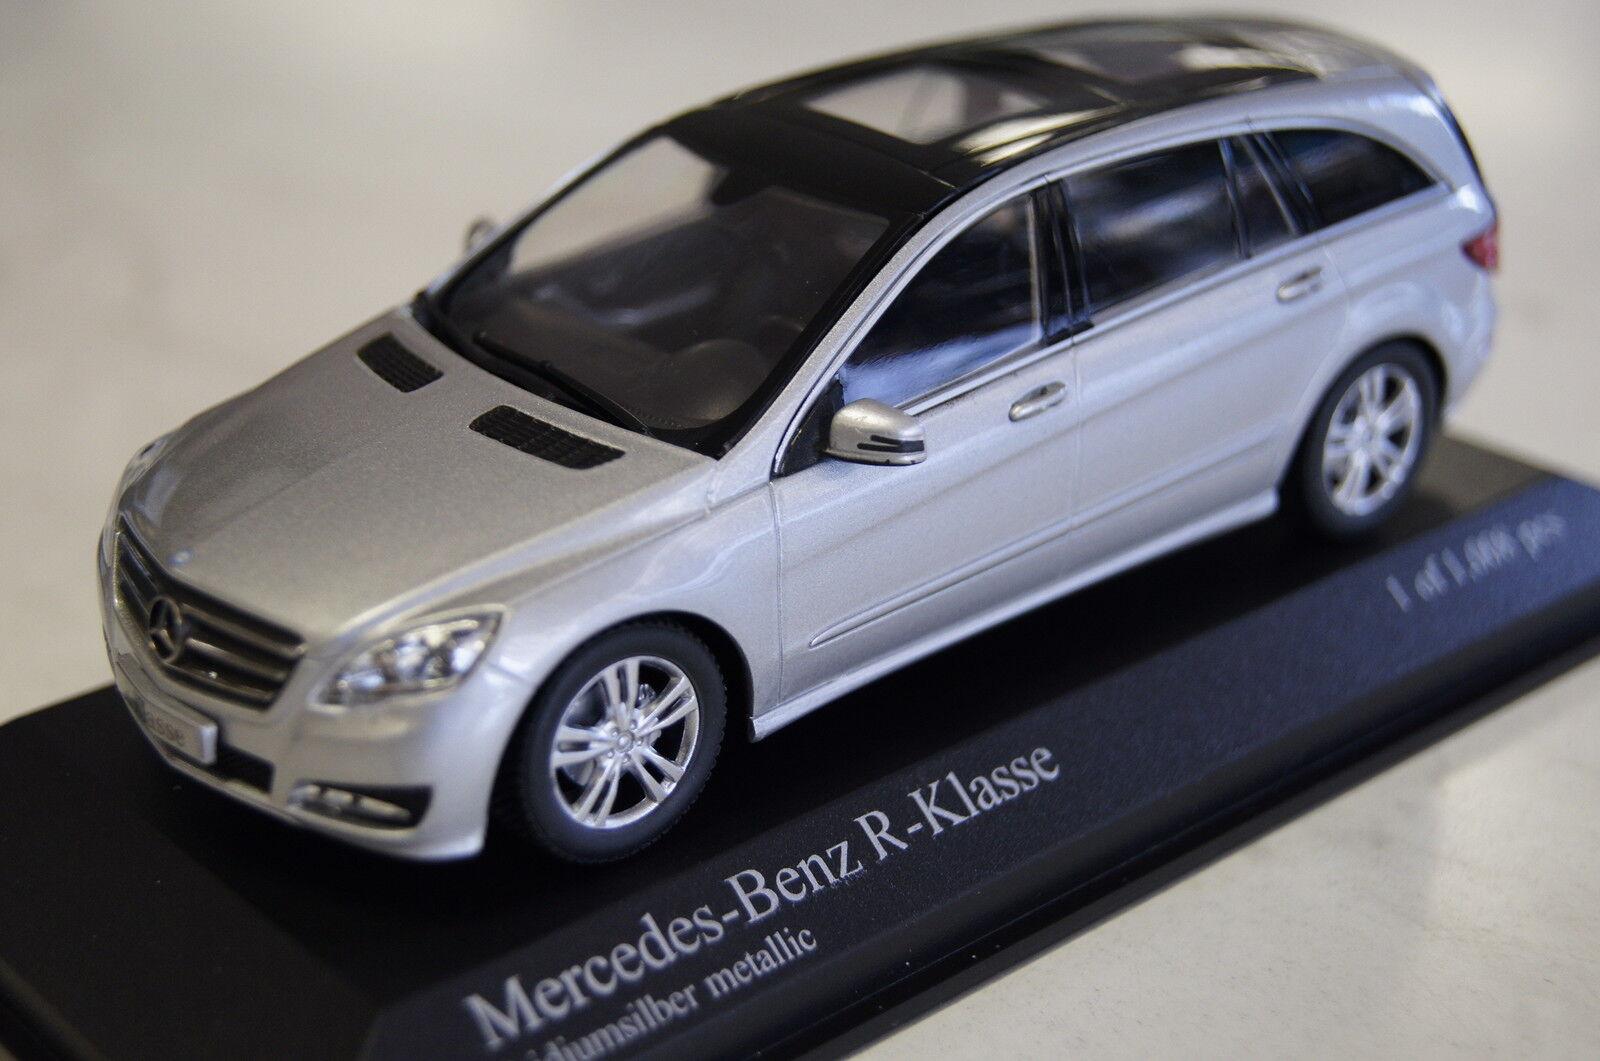 Mercedes R-Klasse 2010 2010 2010 silver 1 43  Minichamps neu & OVP 185be5